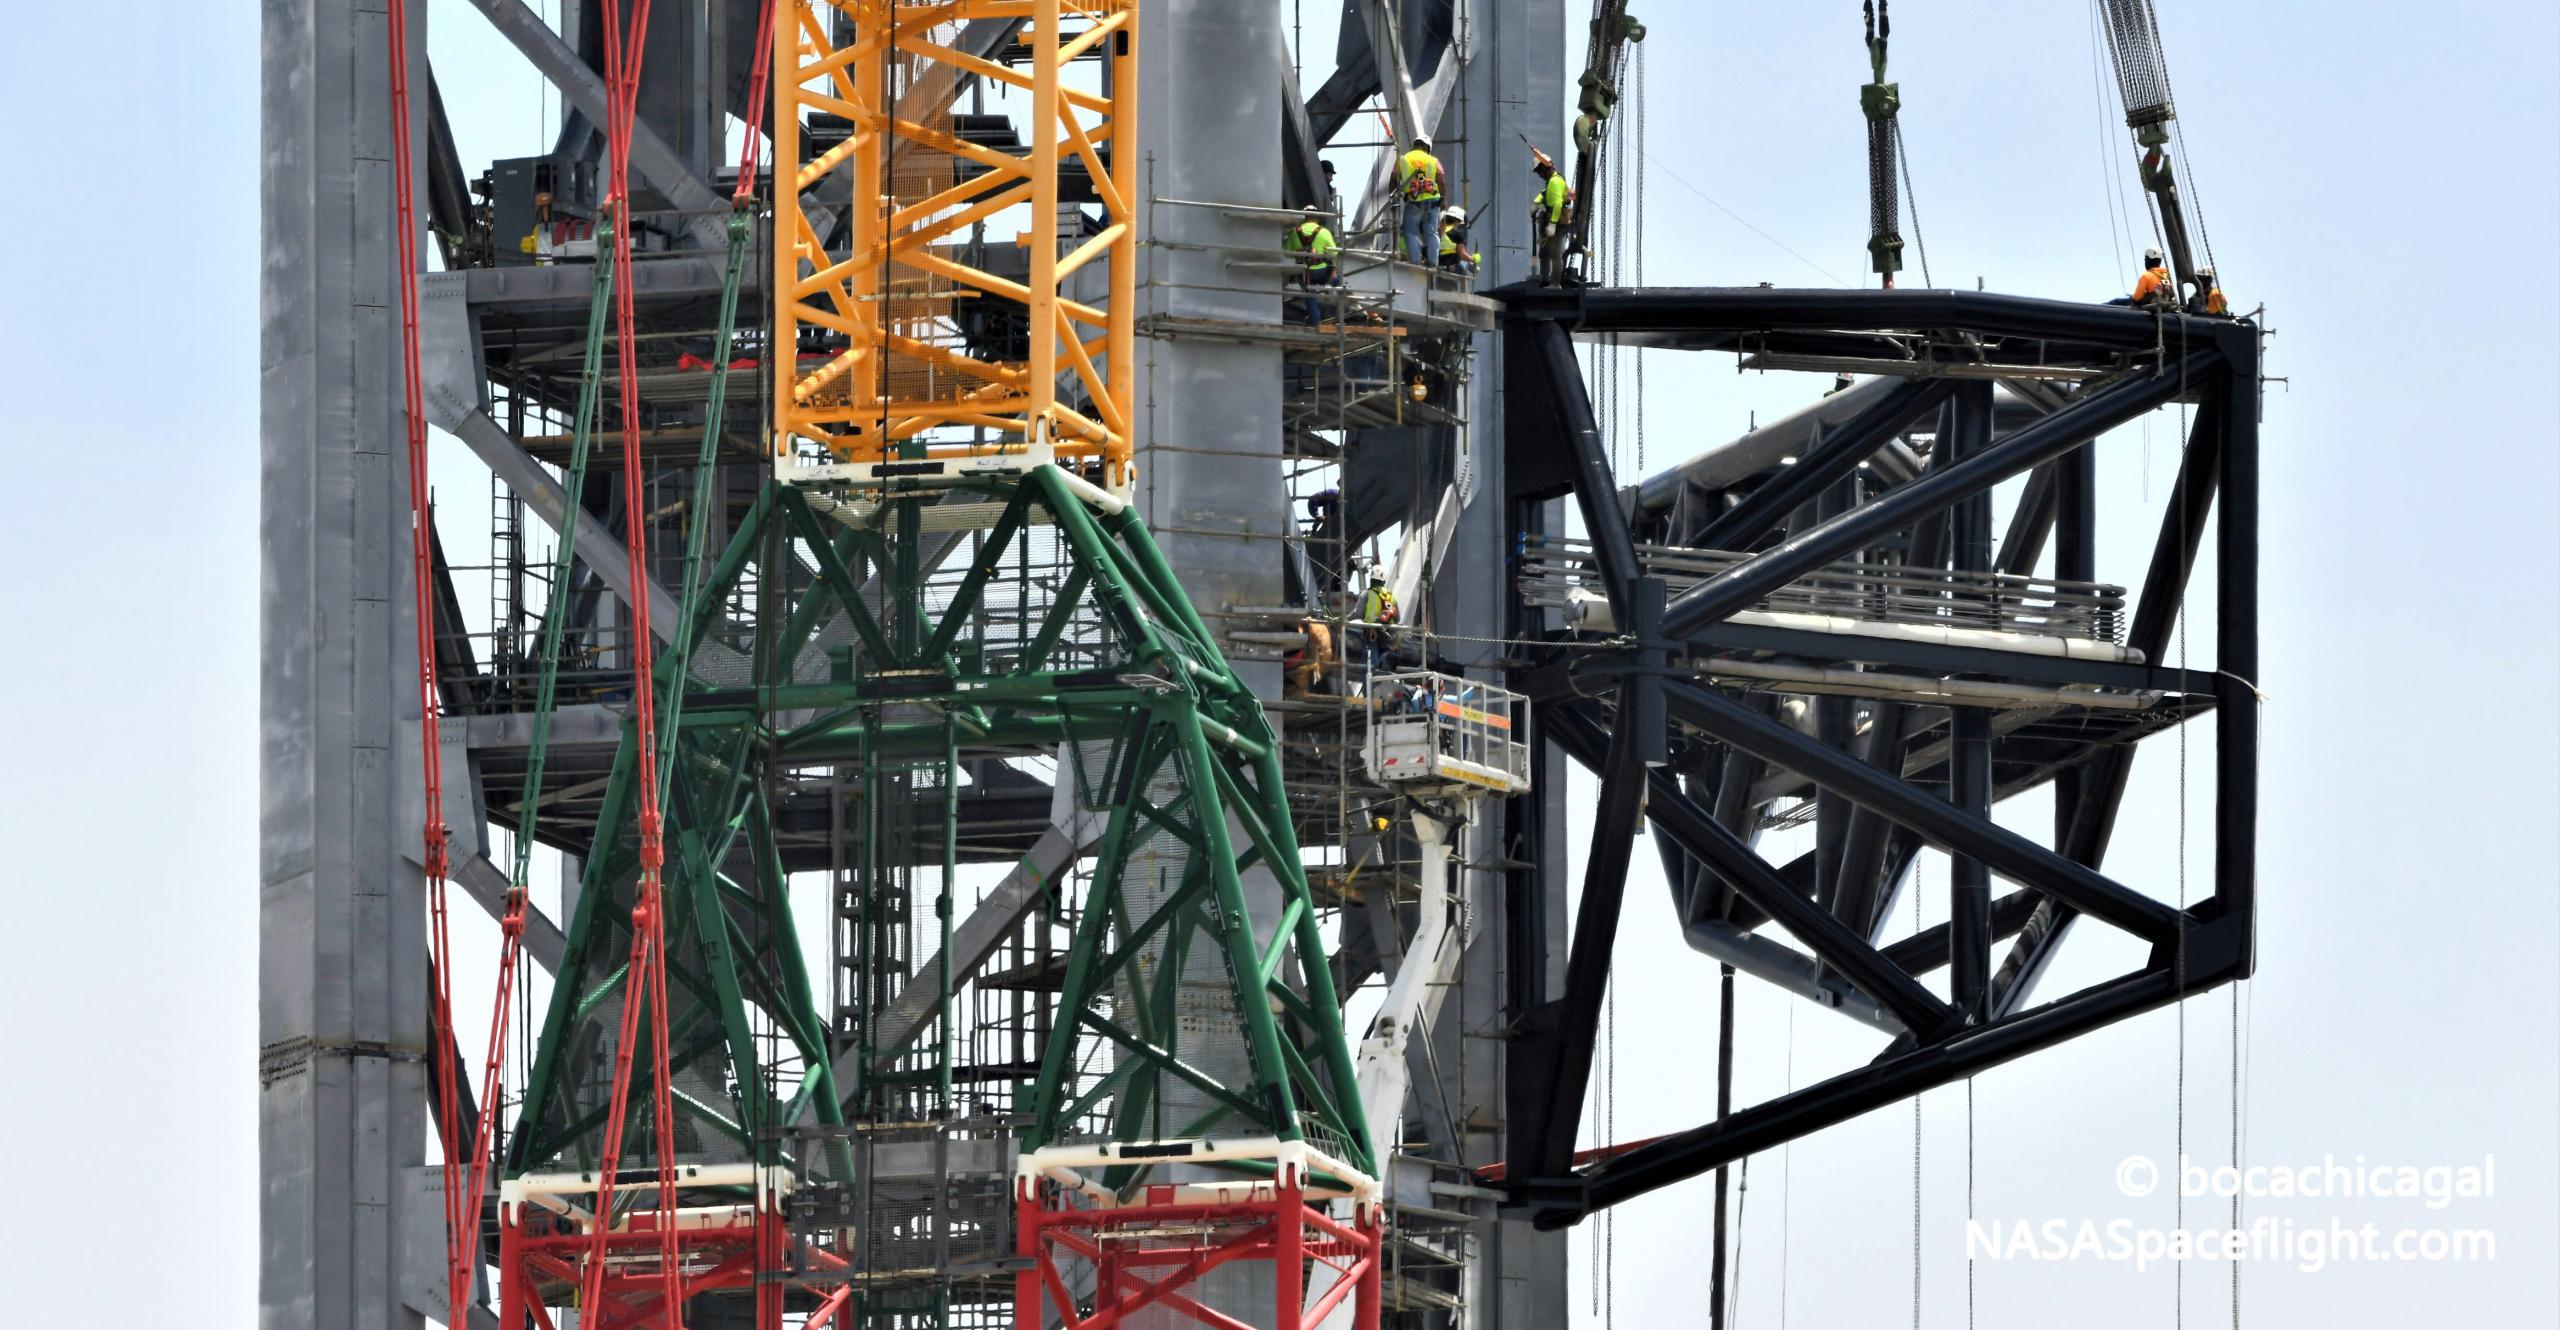 Starship Boca Chica 082921 (NASASpaceflight – bocachicagal) tower QD arm install 2 crop (c)